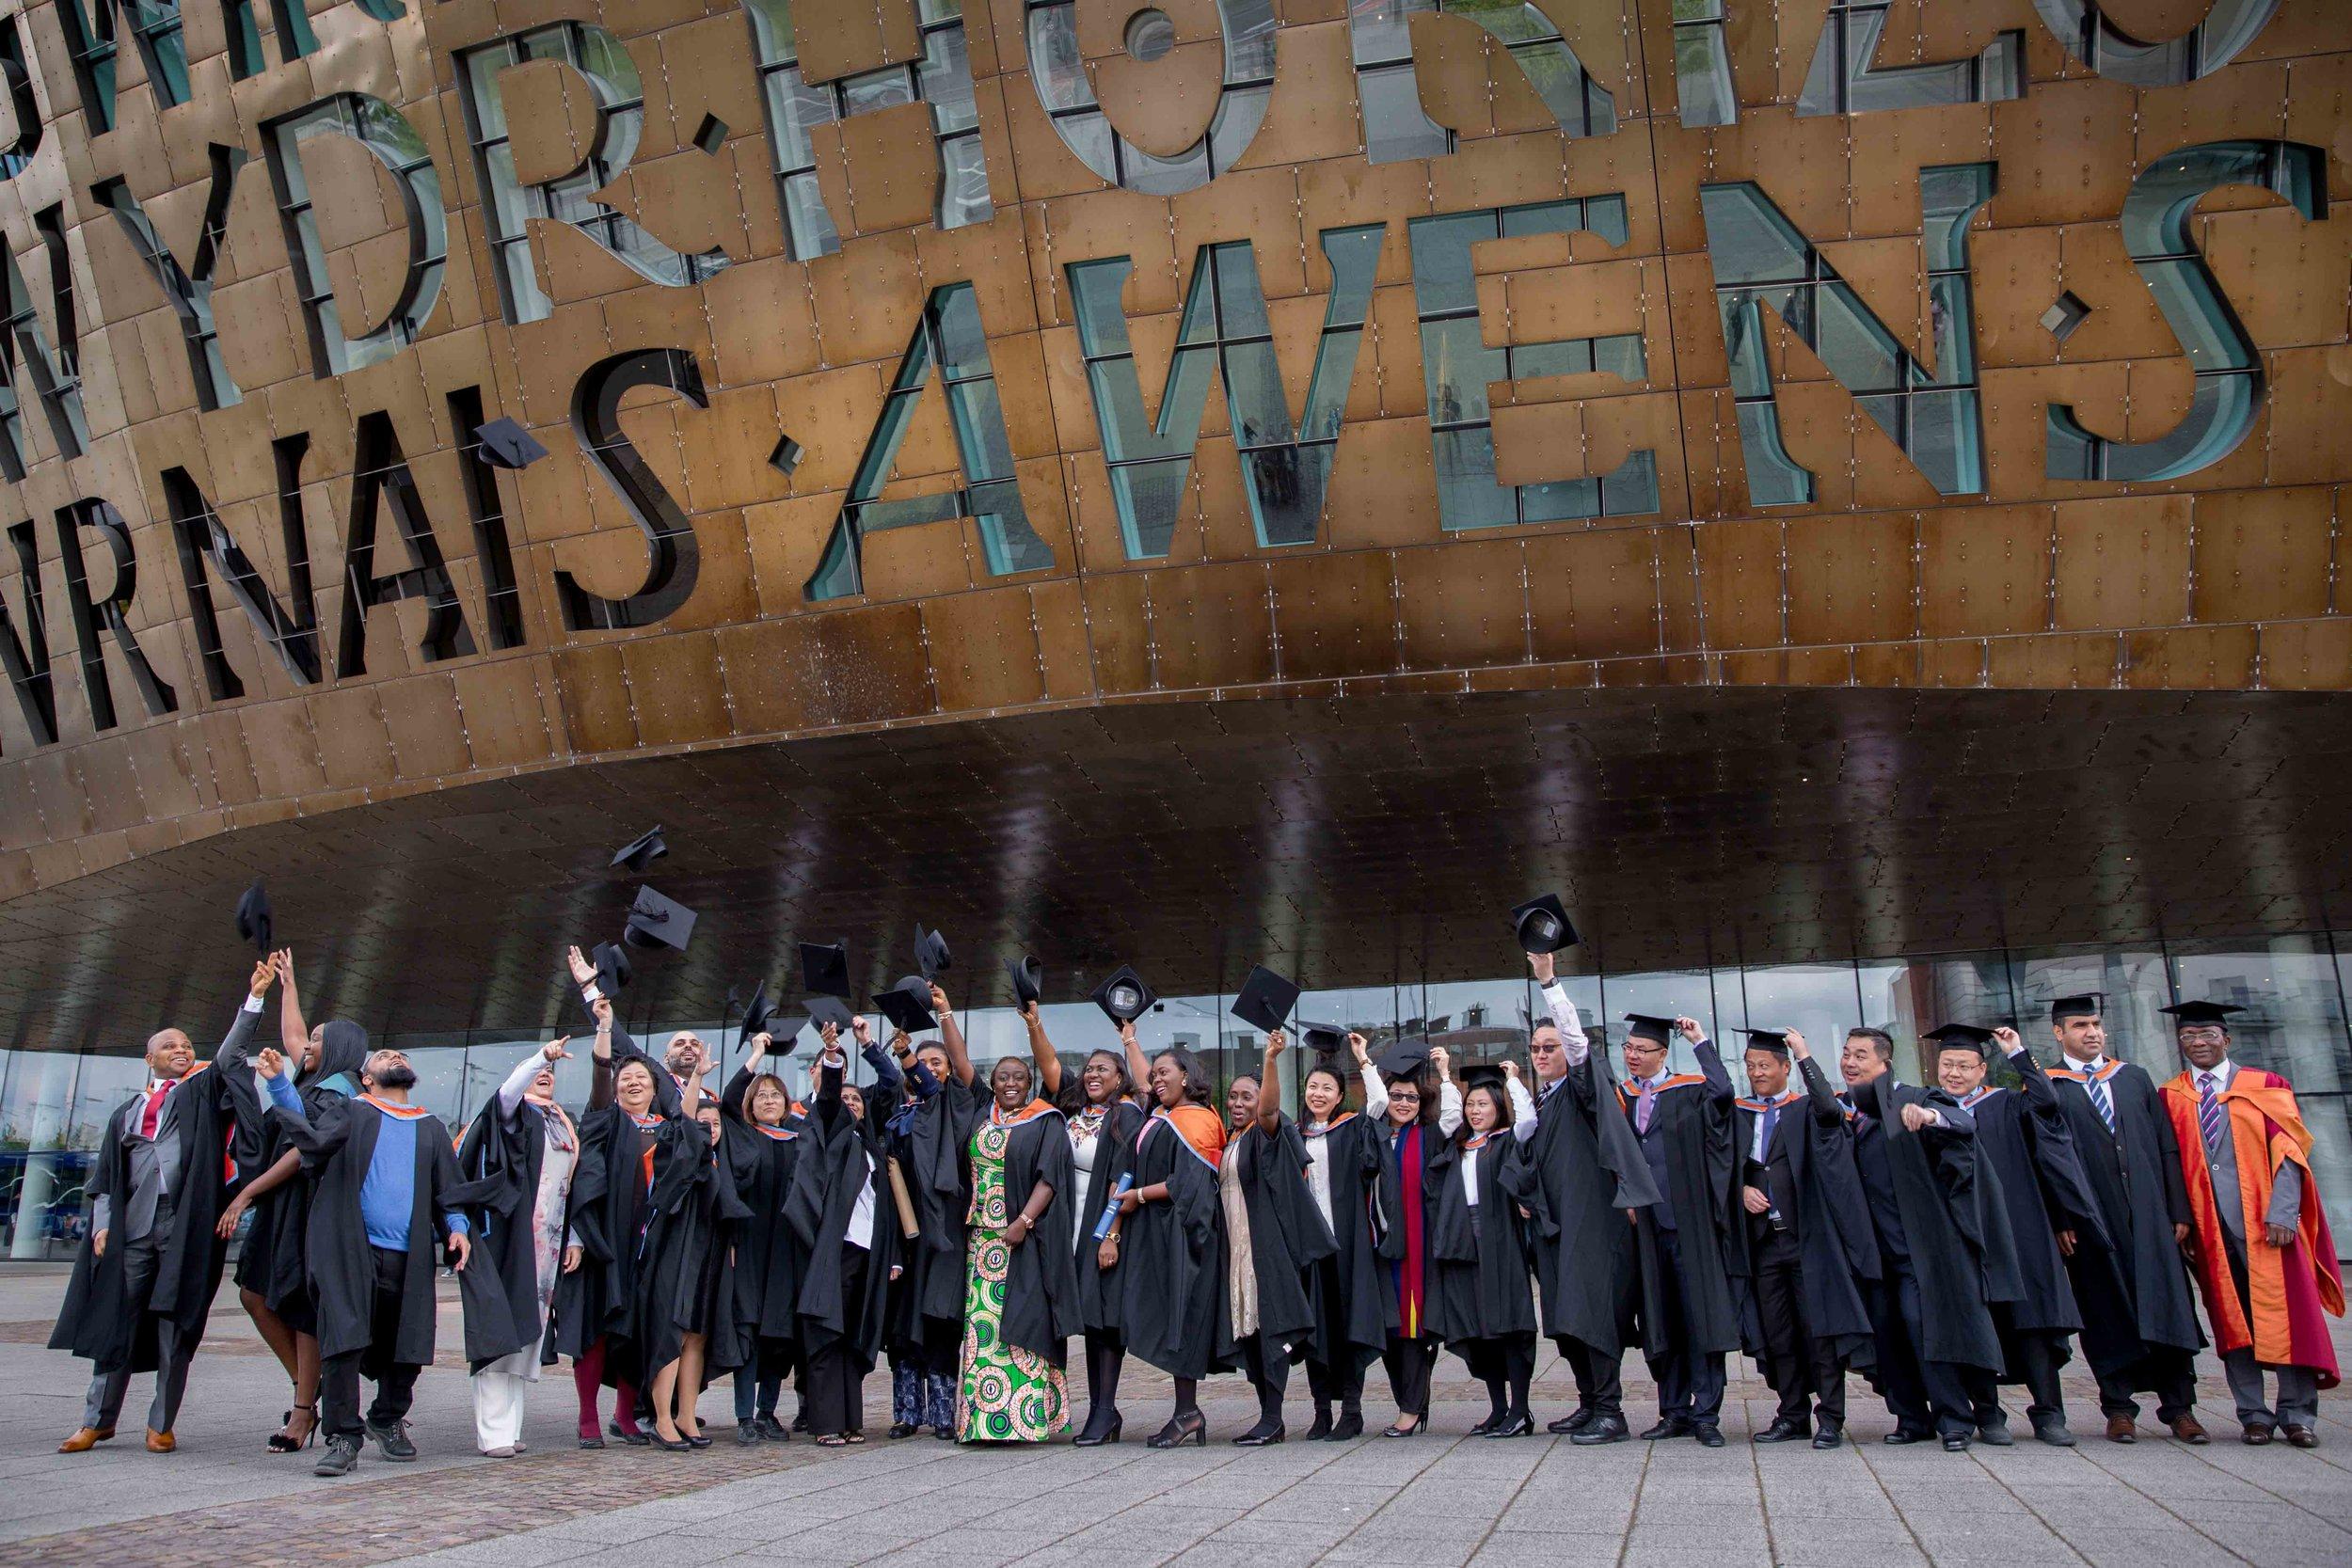 Arden-university-graduation-commercial-photographer-cardiff-natalia-smith-photography-32.jpg